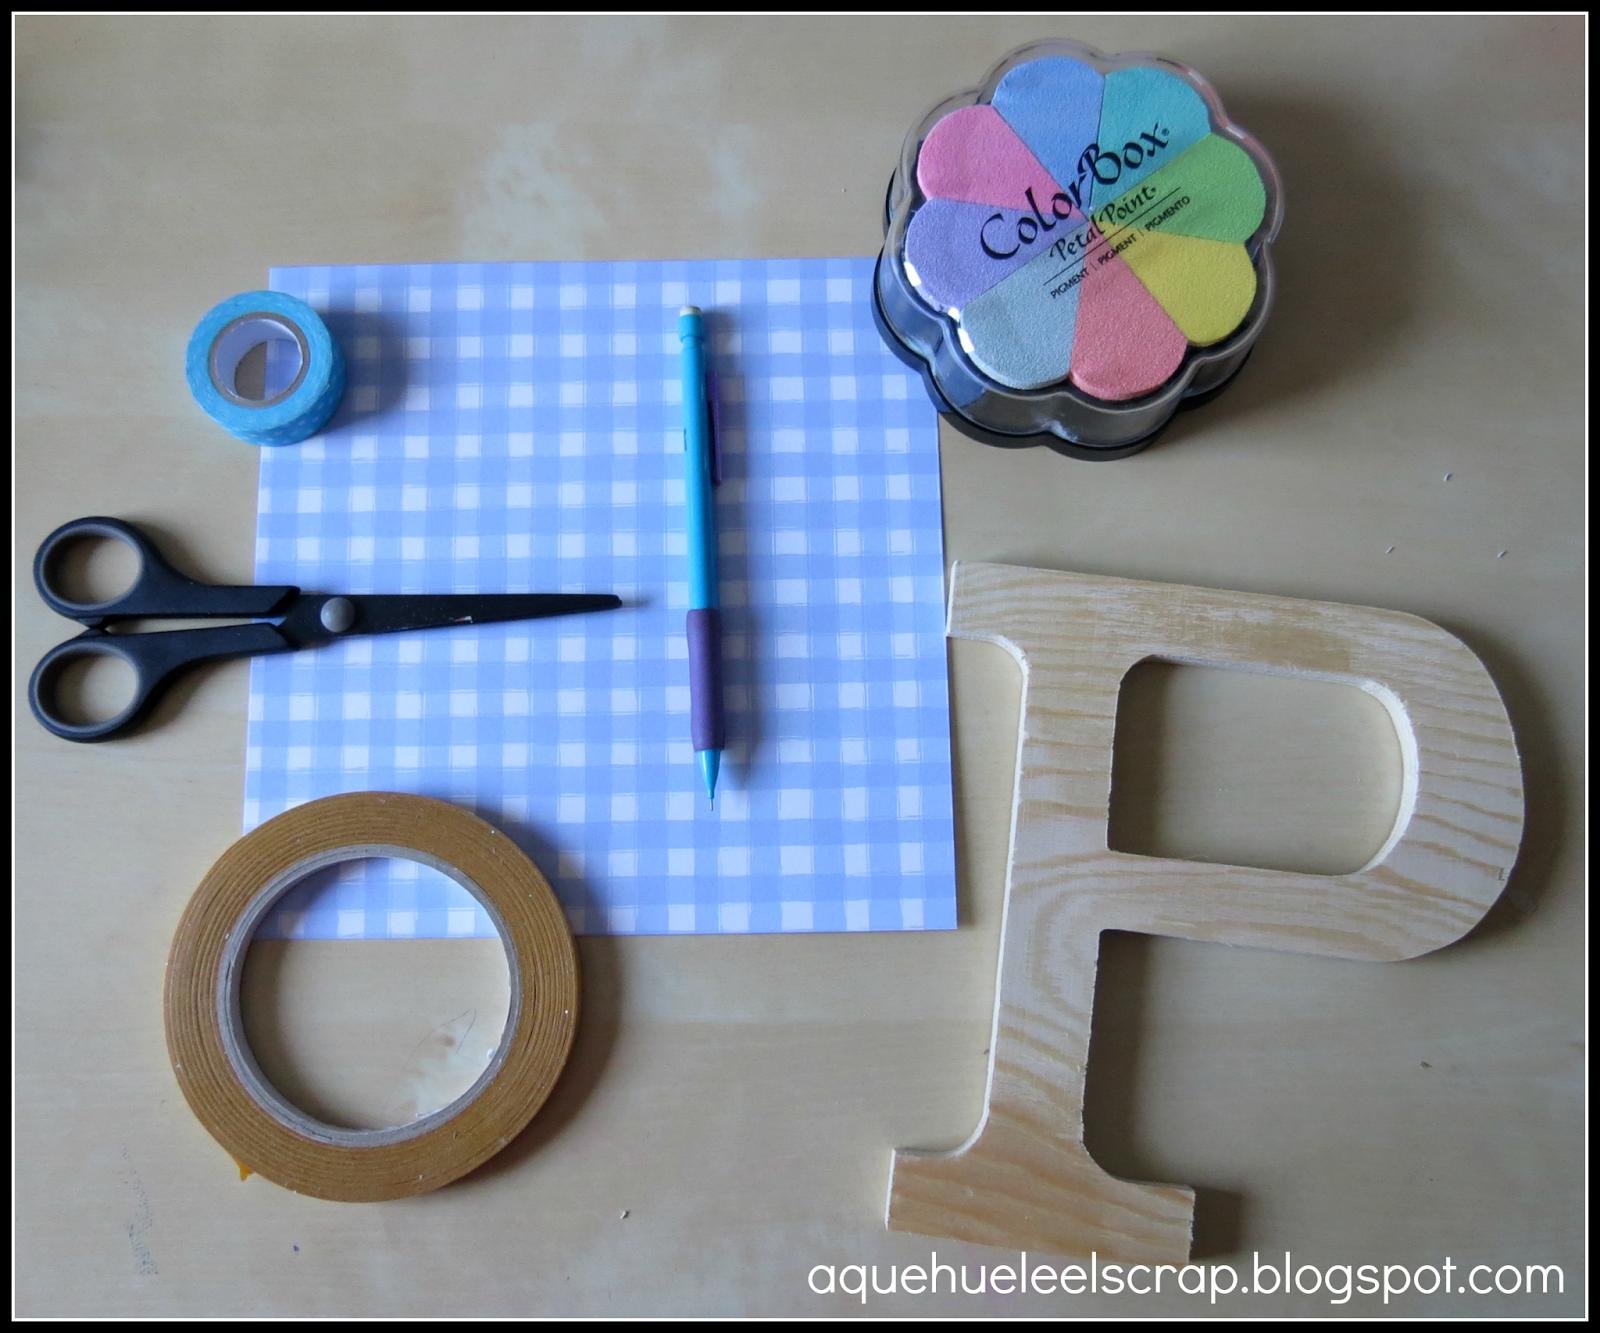 A qu huele el scrap tutorial decora una letra de madera for Como pegar papel mural en madera